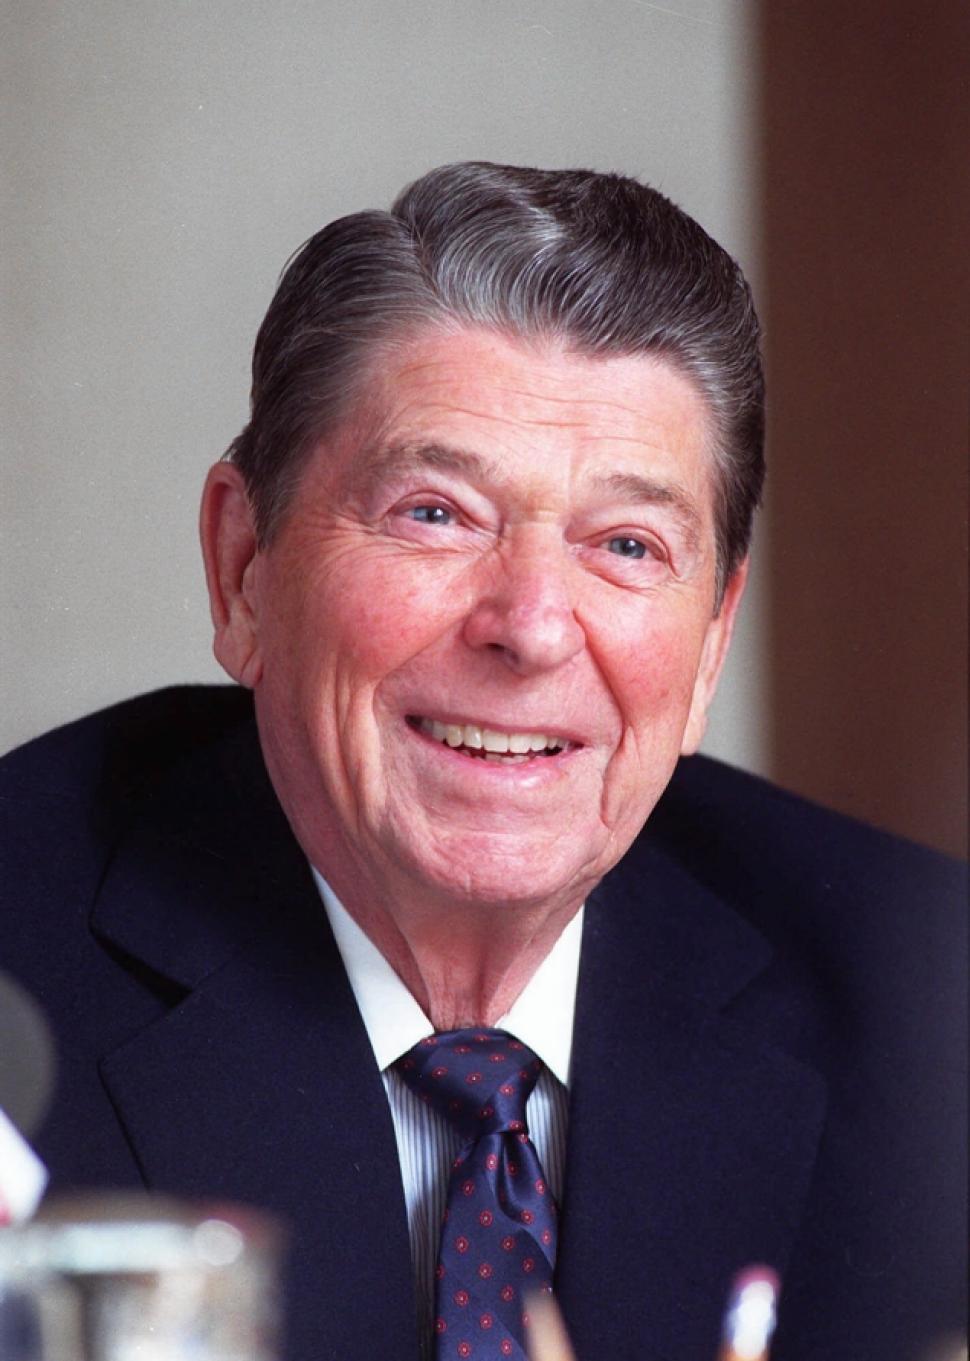 Politician Ronald Reagan - age: 93